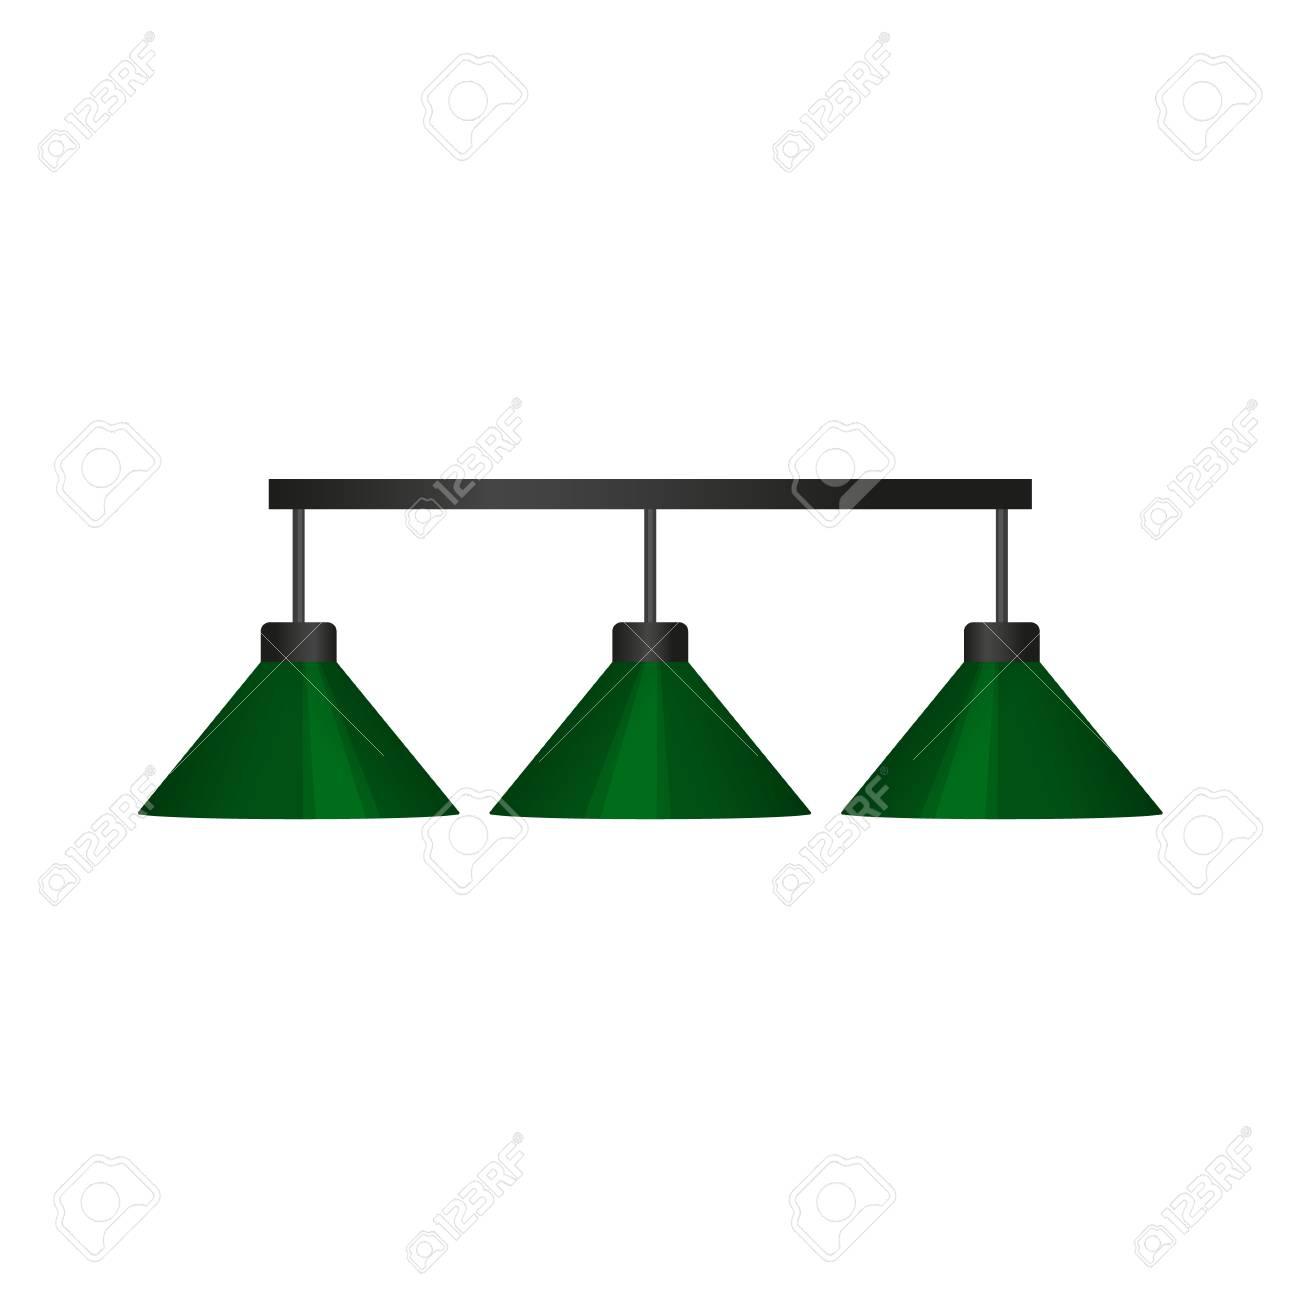 un billar lámpara de Vector de blancoSnooker animados aislada dibujos en verdeIlustración profesionalequipos colgante de fondo plana pool rChdQstx